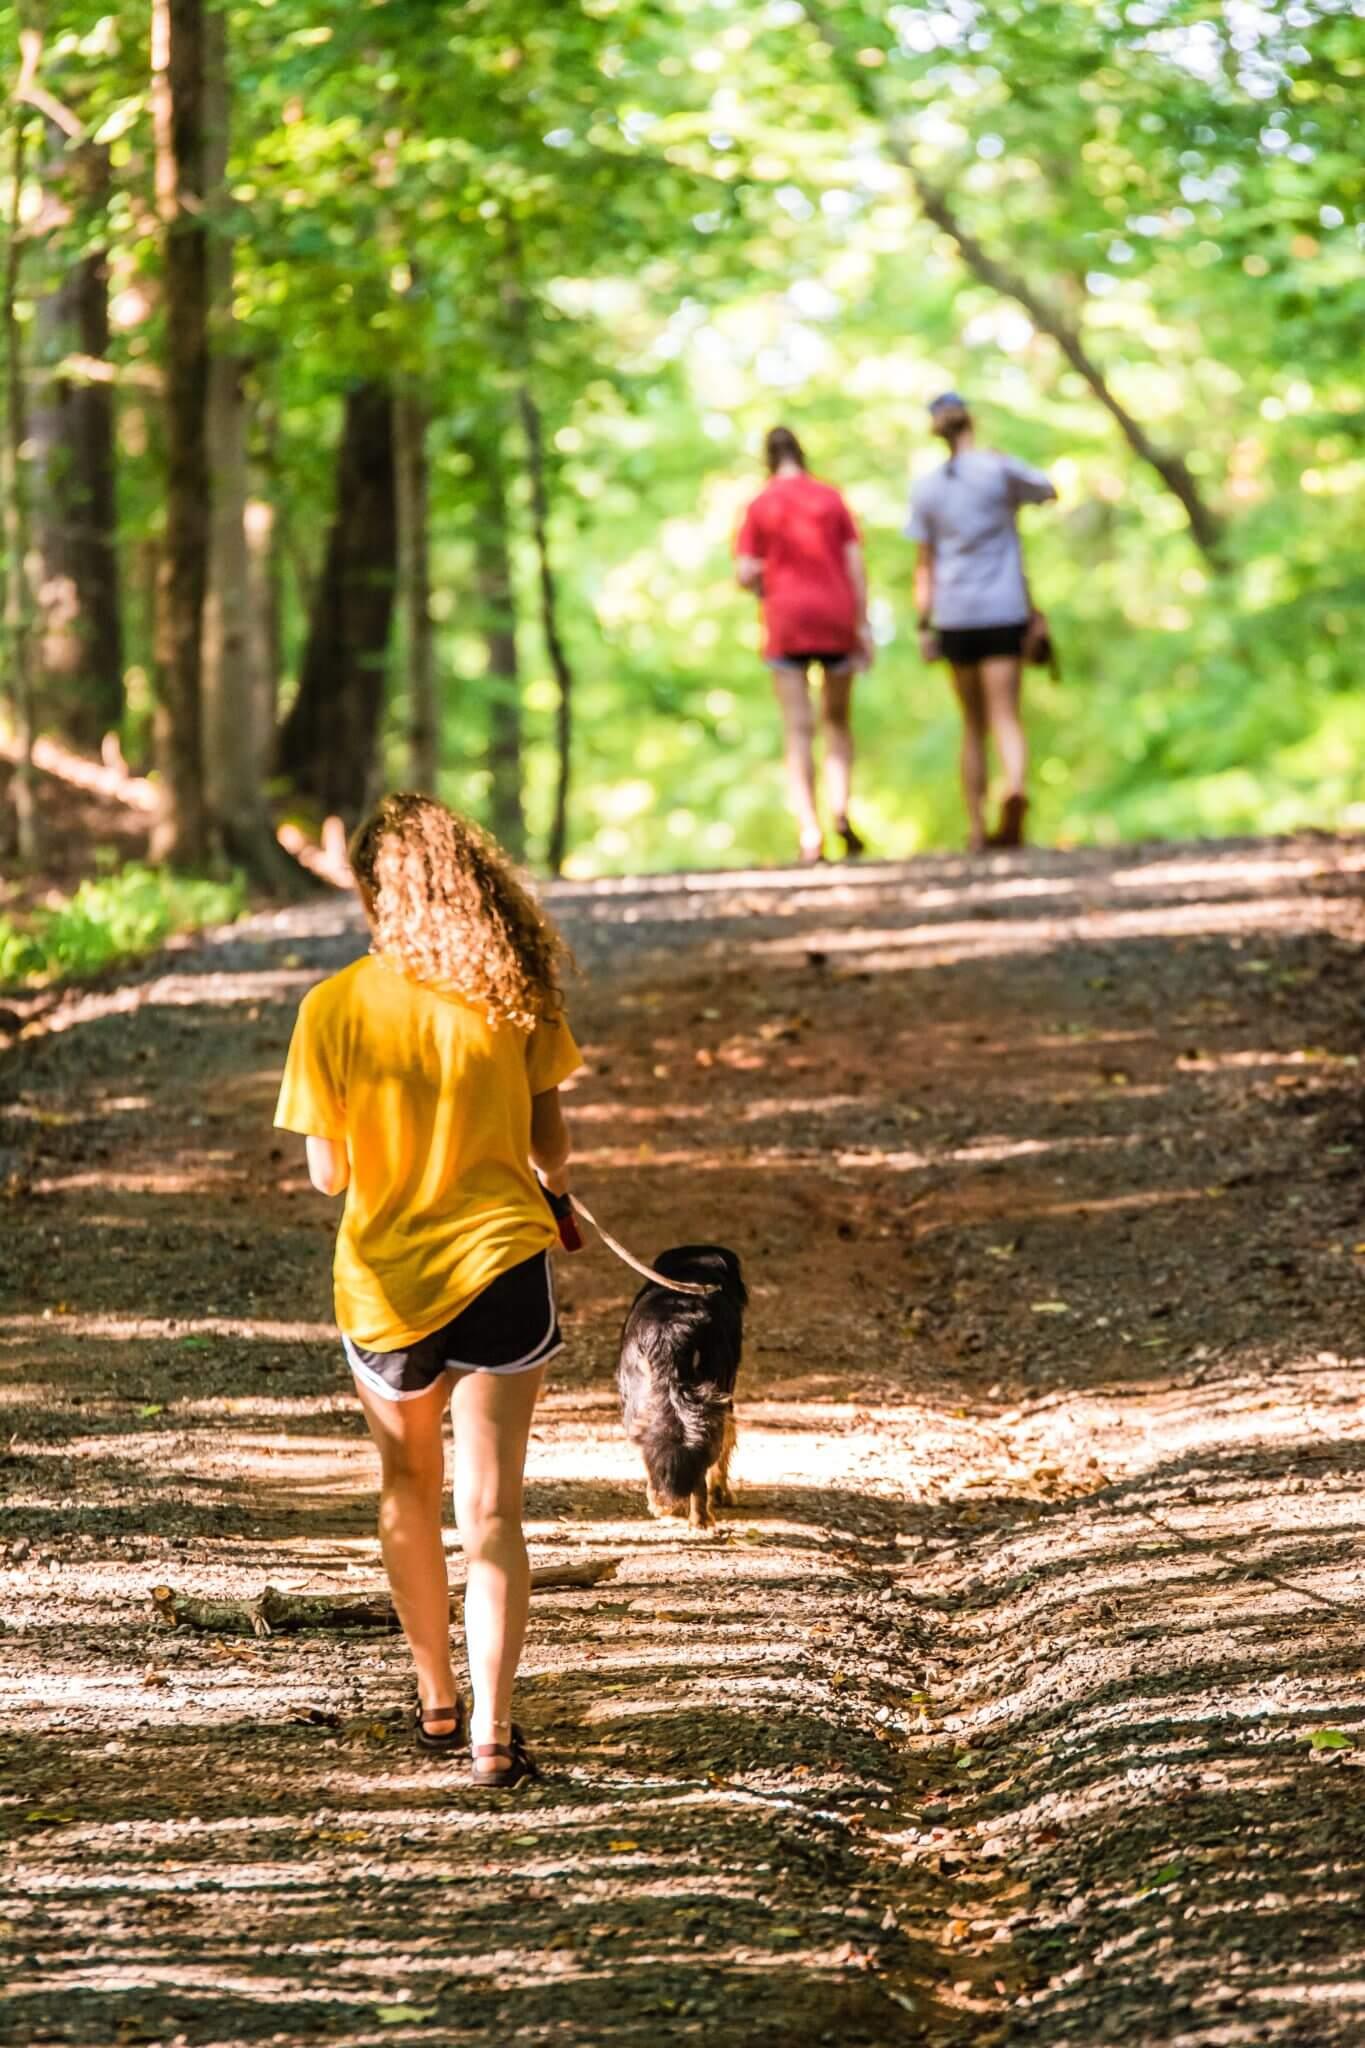 active-dog-walking-enjoyment-1504187